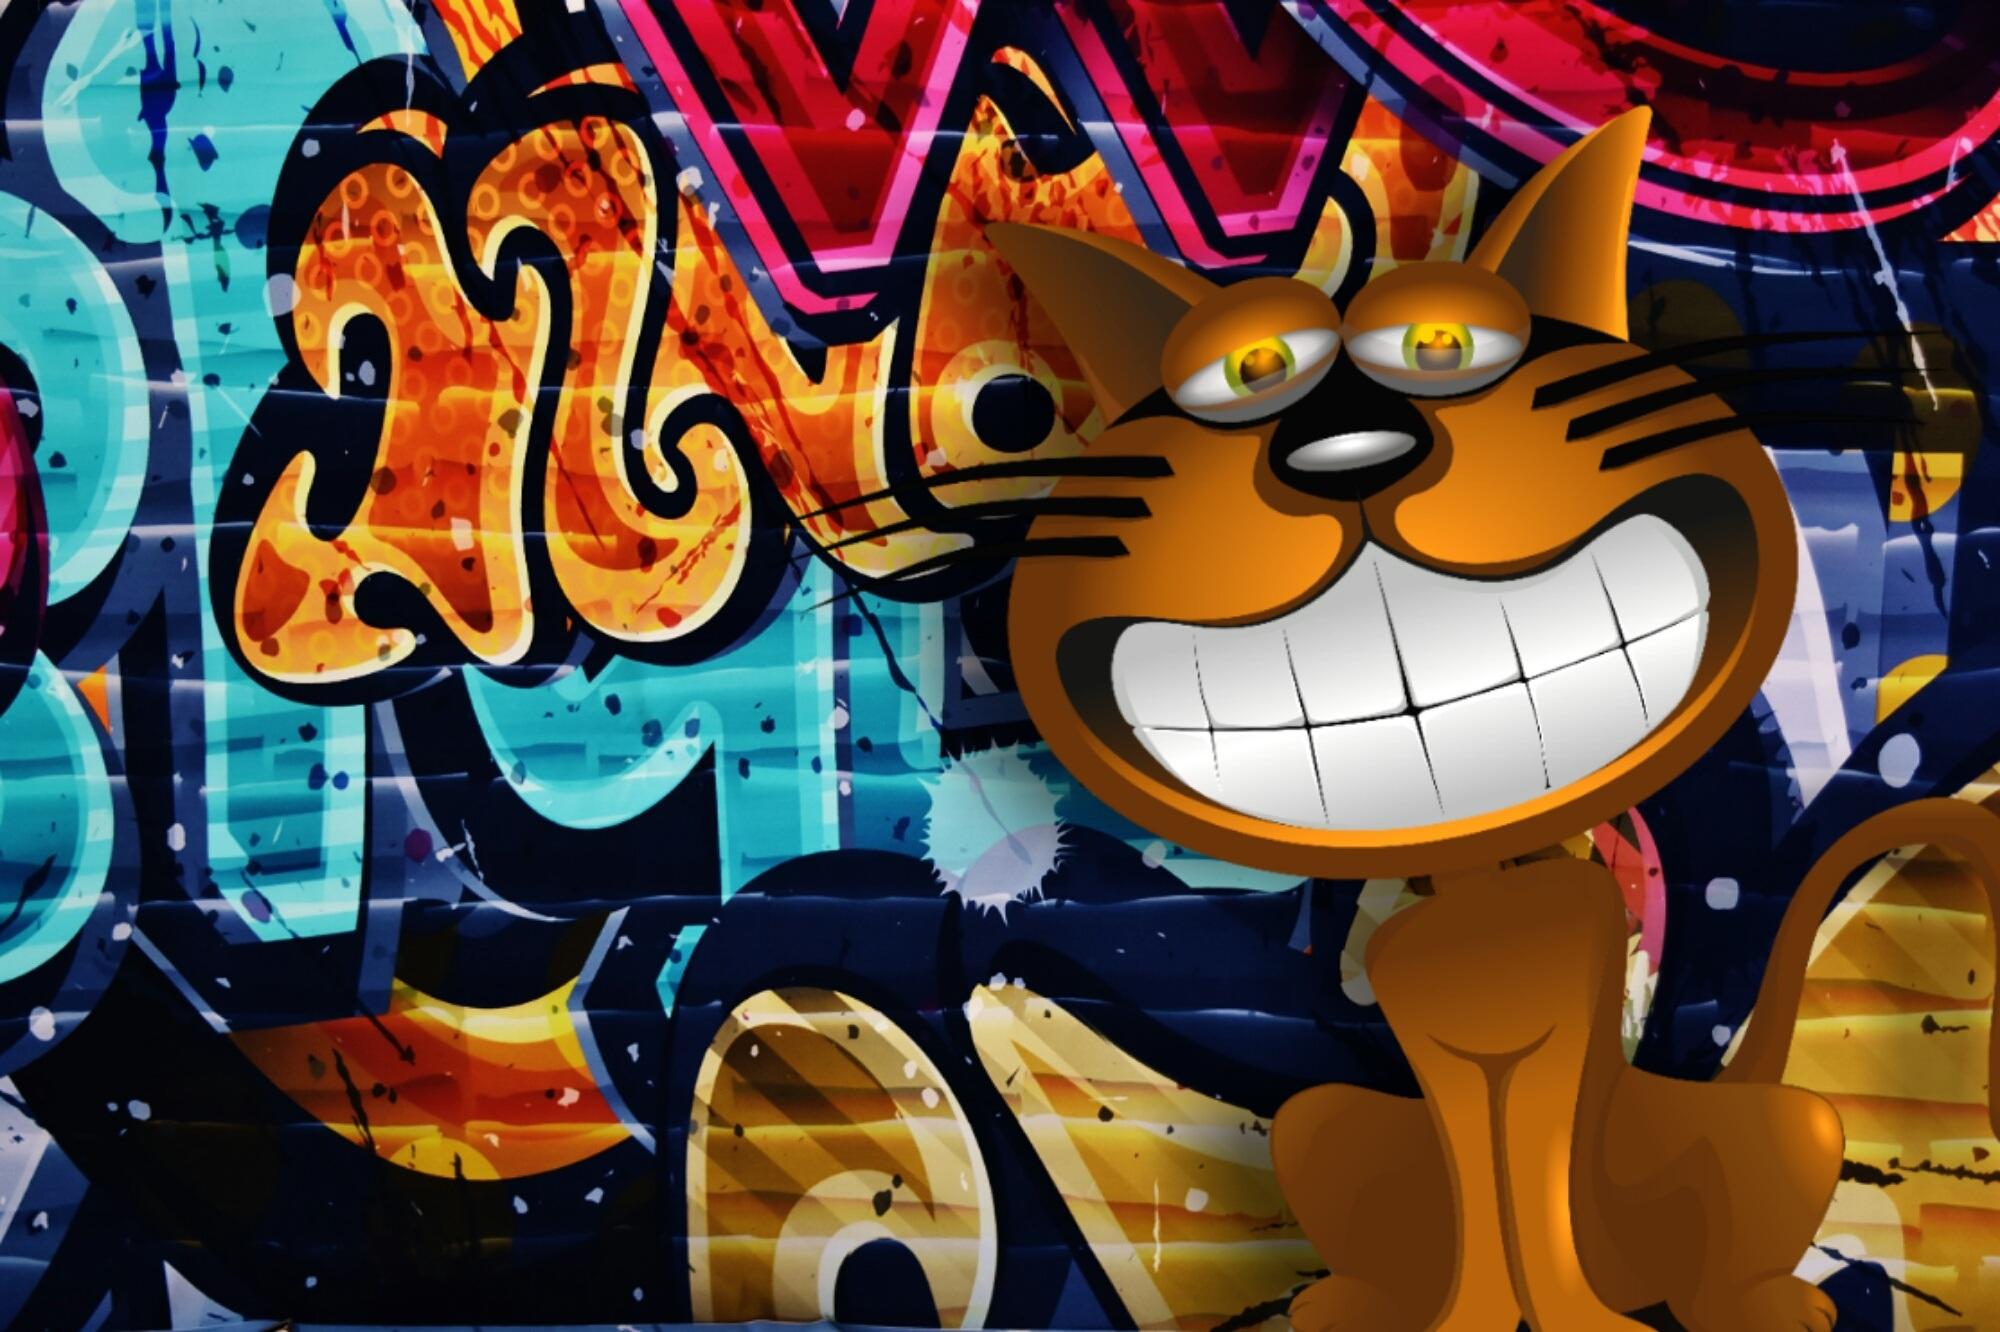 Gambar Kucing Warna Warni Coretan Seni Ilustrasi Lucu